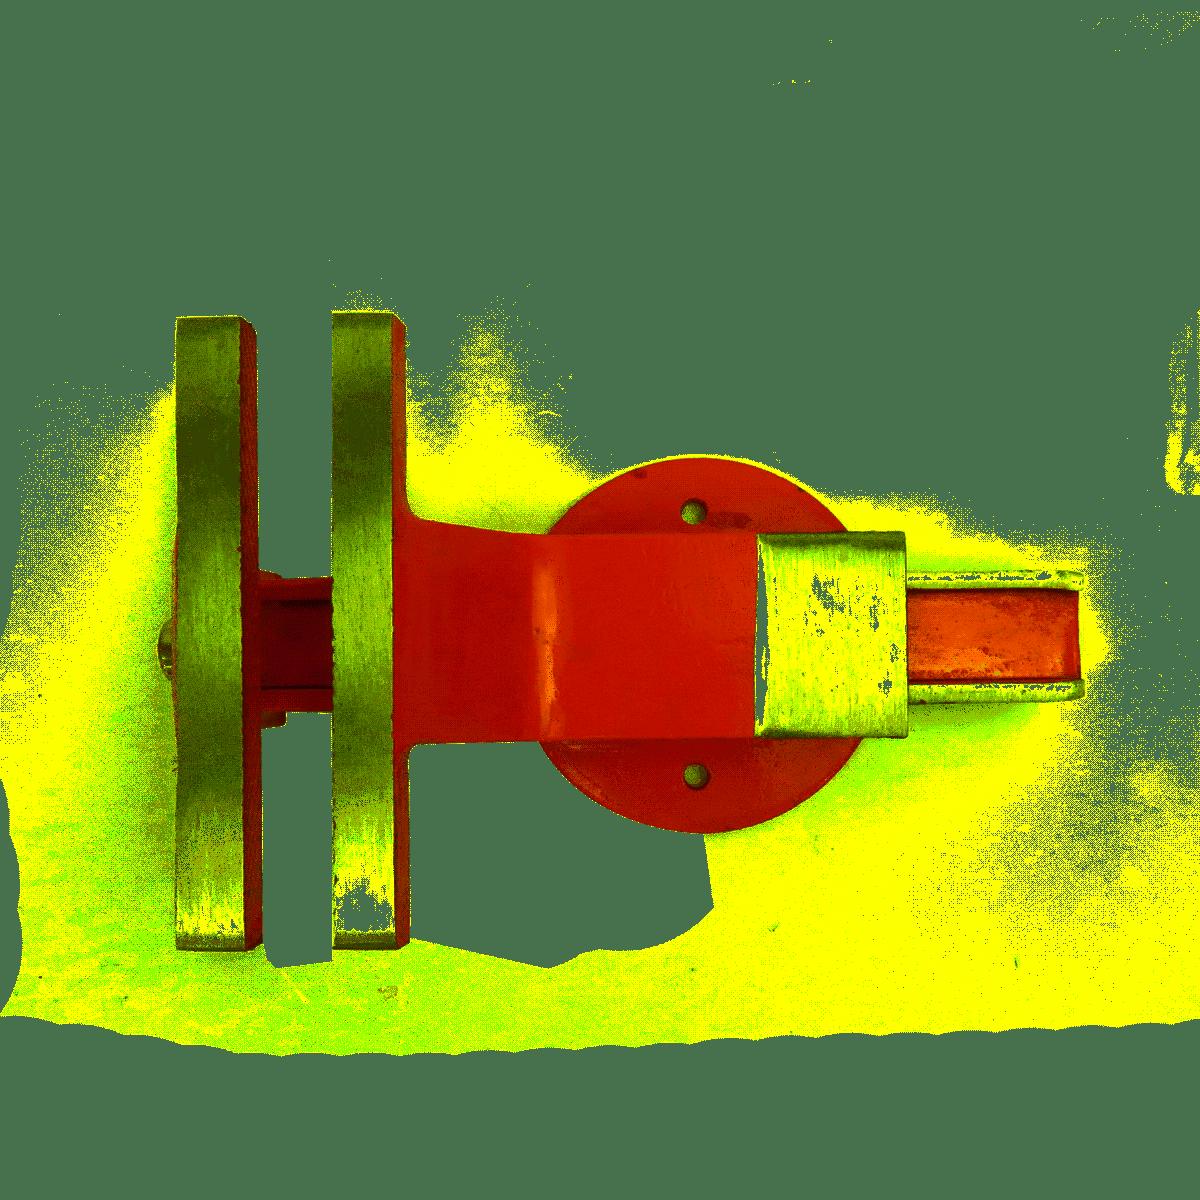 Torno Morsa De Bancada 200mm EDA 5RU Base Fixa Ferro Fundido Numero 8